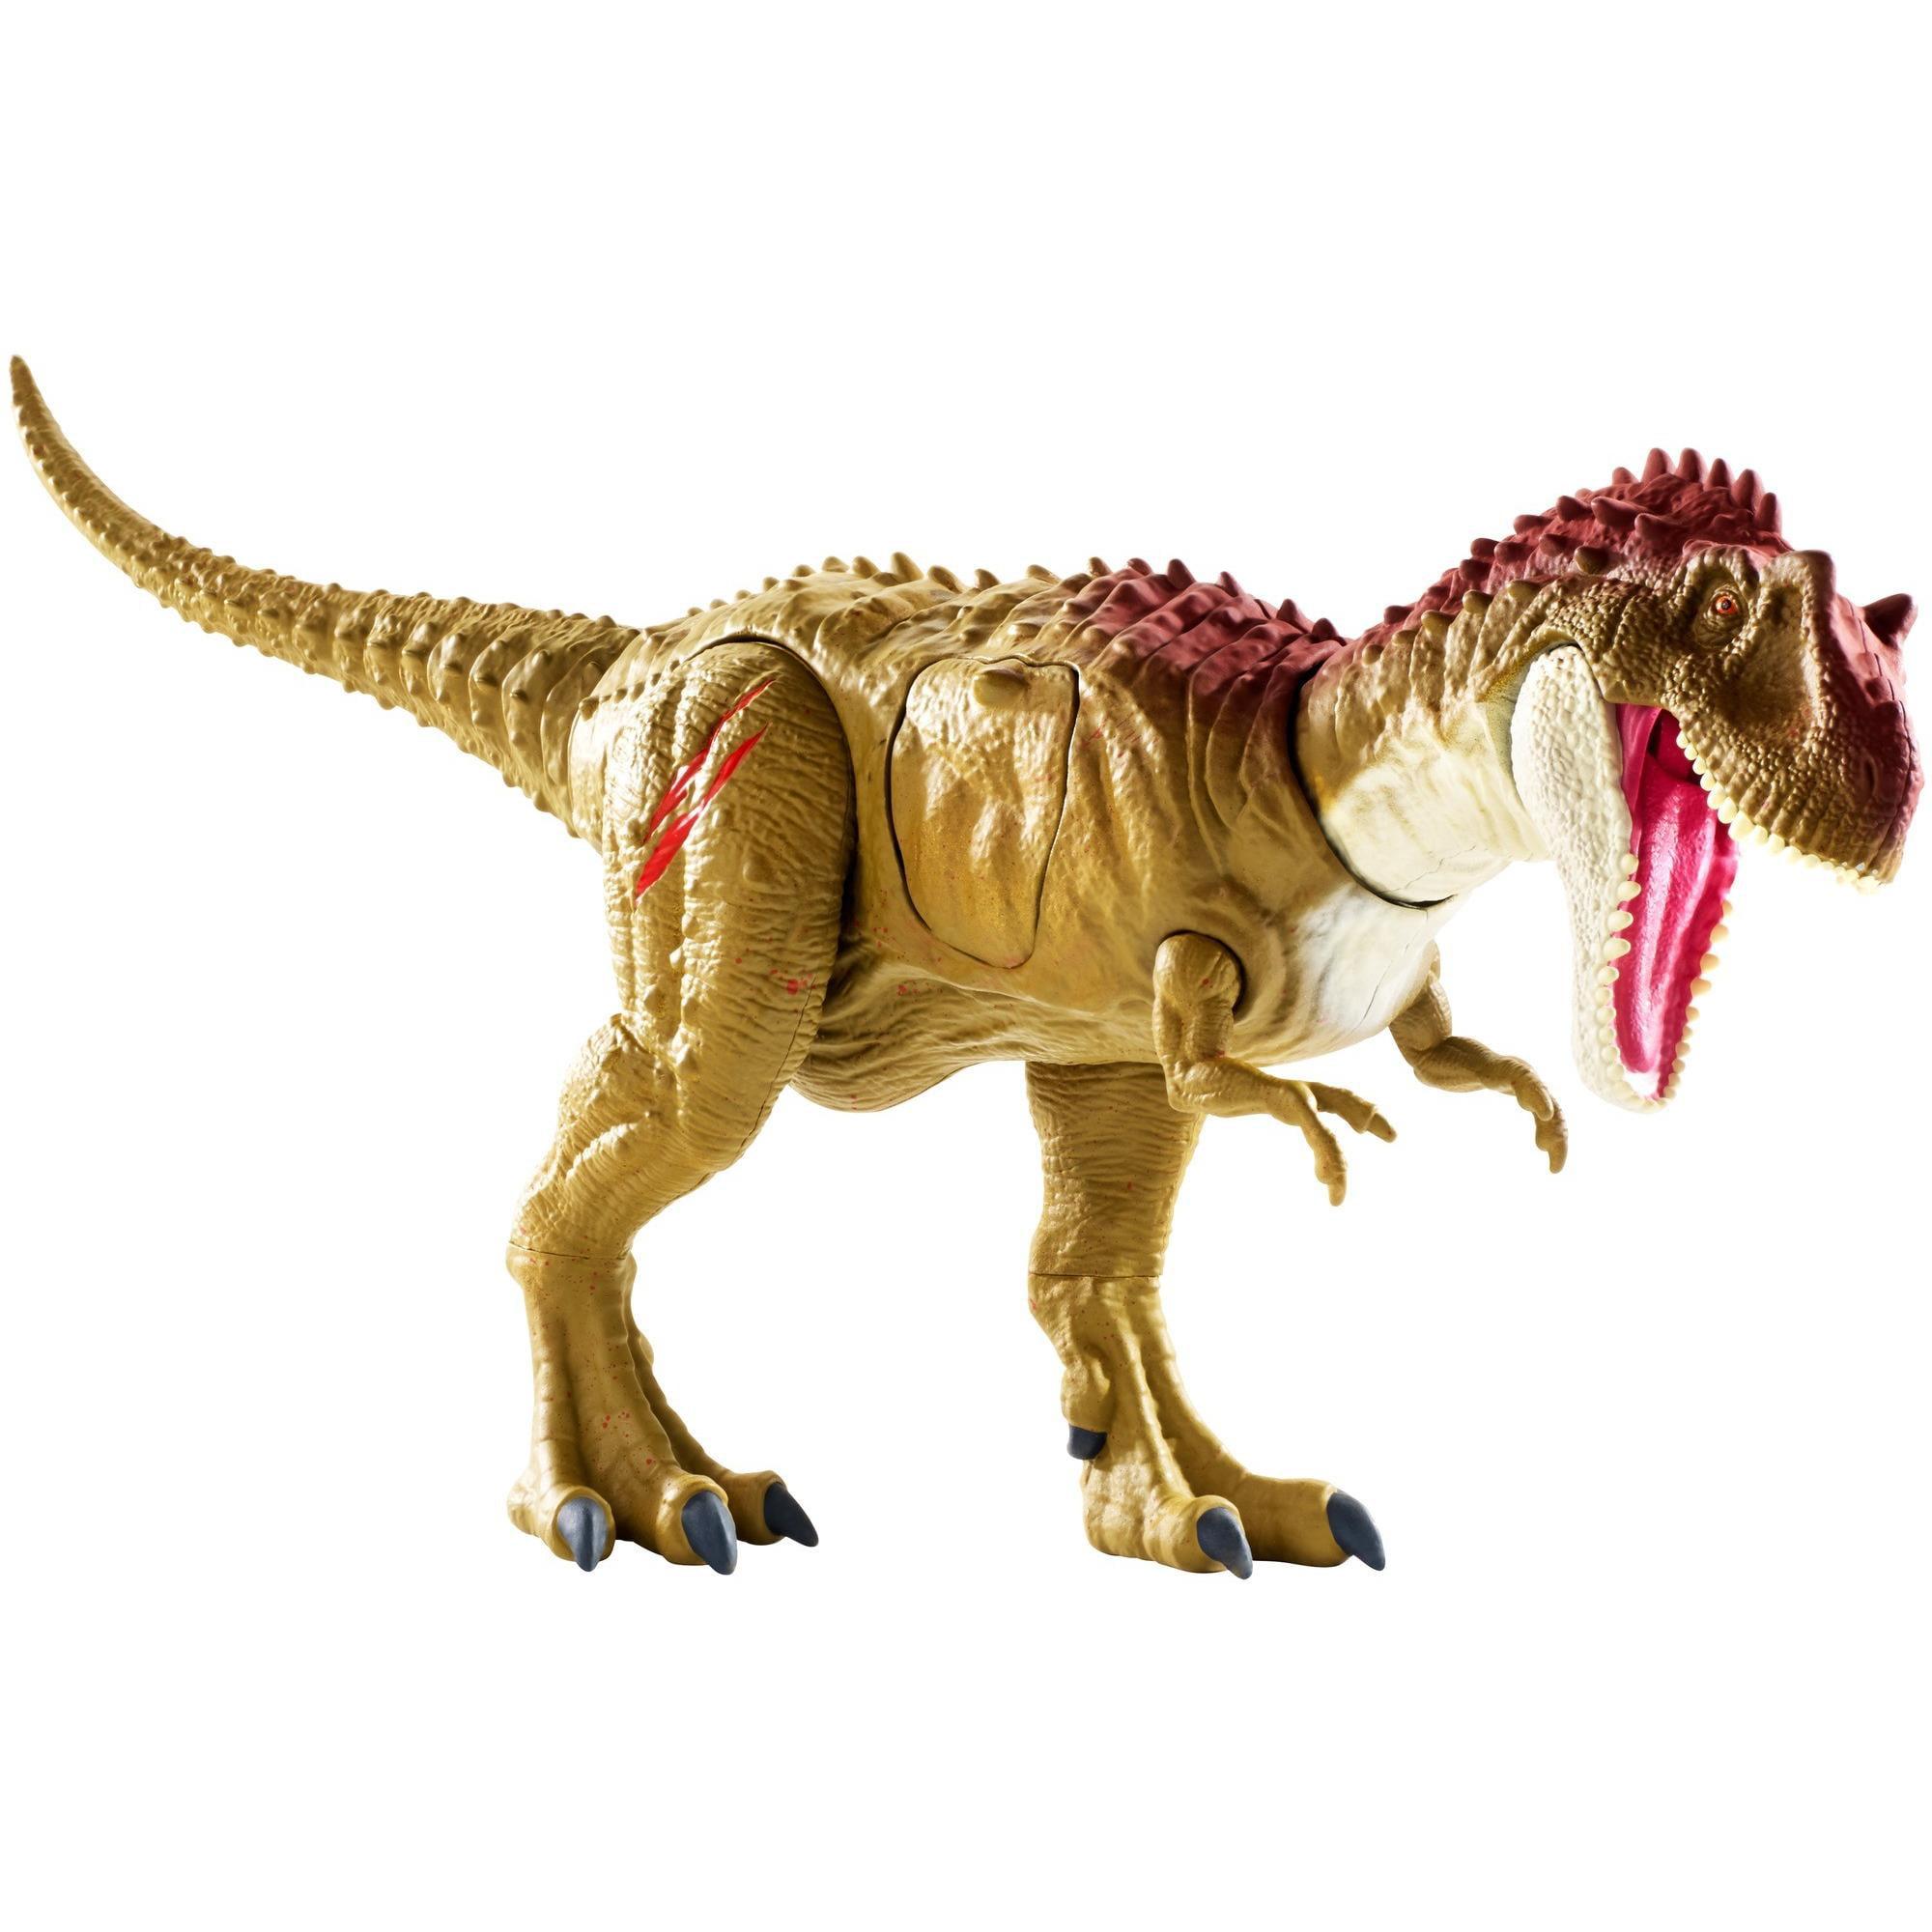 Jurassic World Battle Damage Albertosaurus Dinosaur